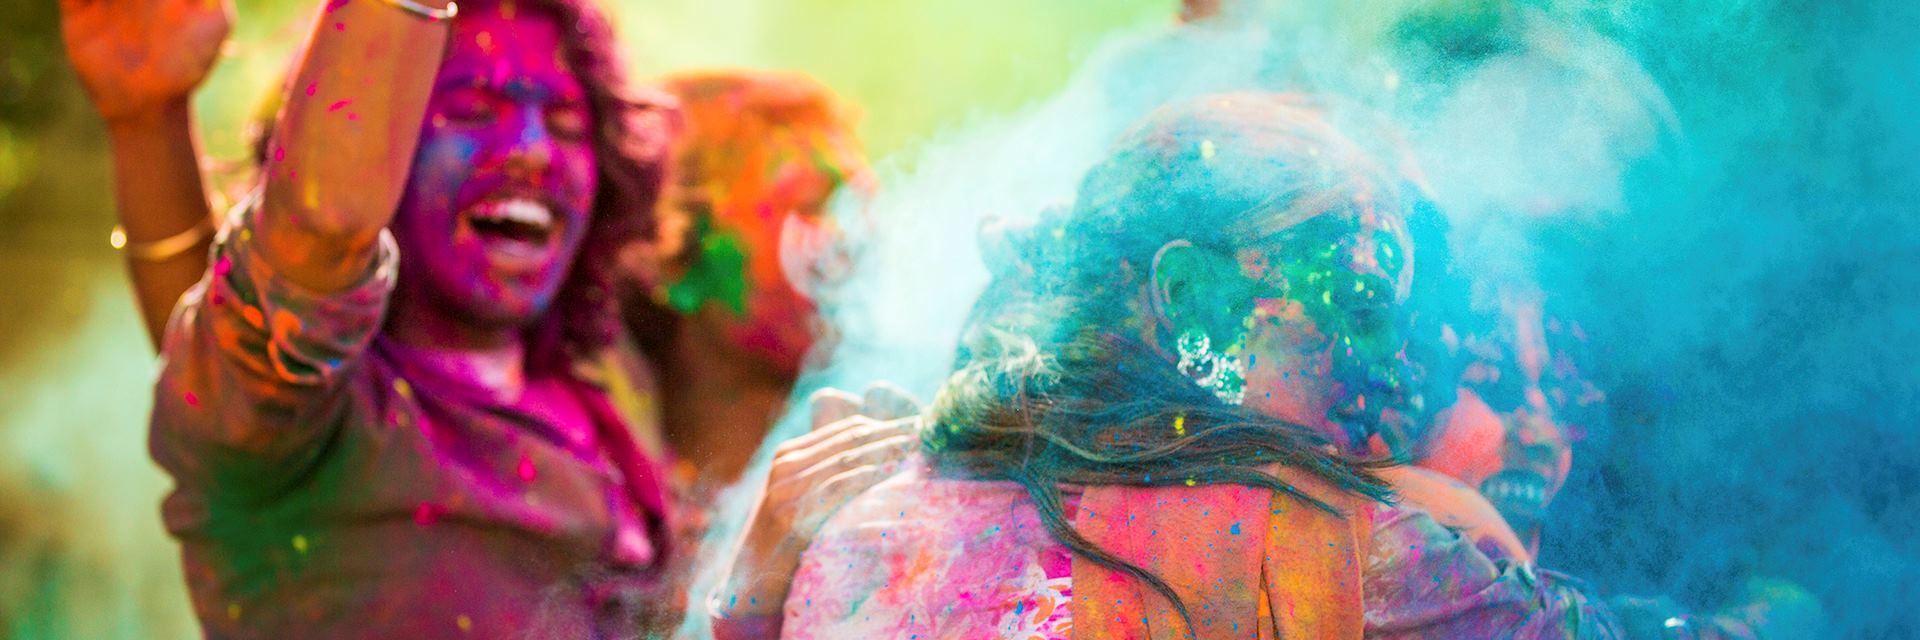 Holi festival of colours in India